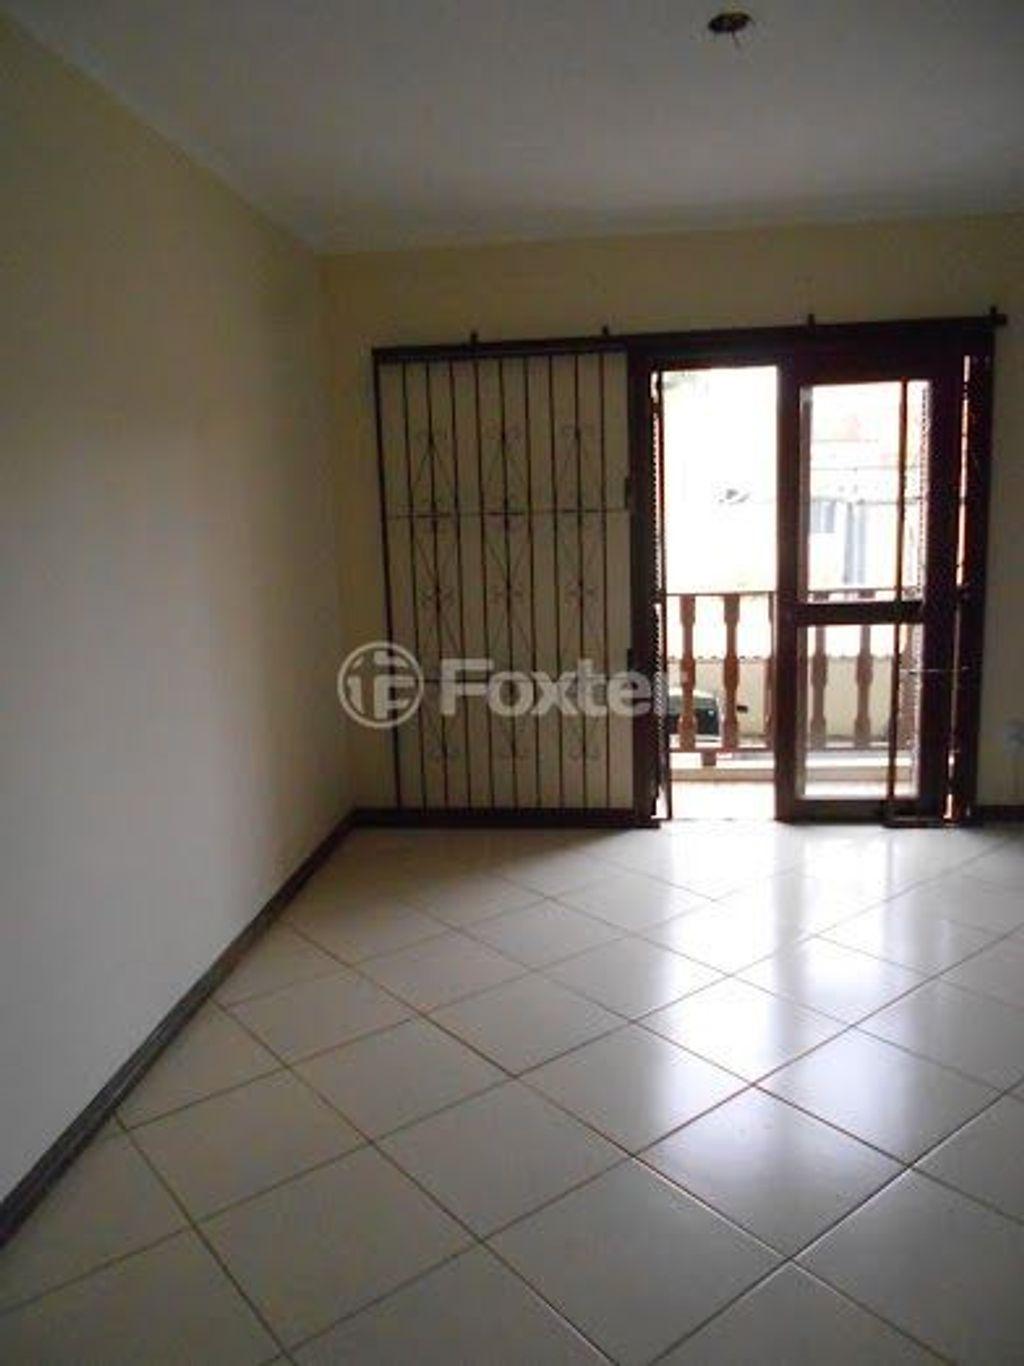 Casa 3 Dorm, Cavalhada, Porto Alegre (143368) - Foto 13